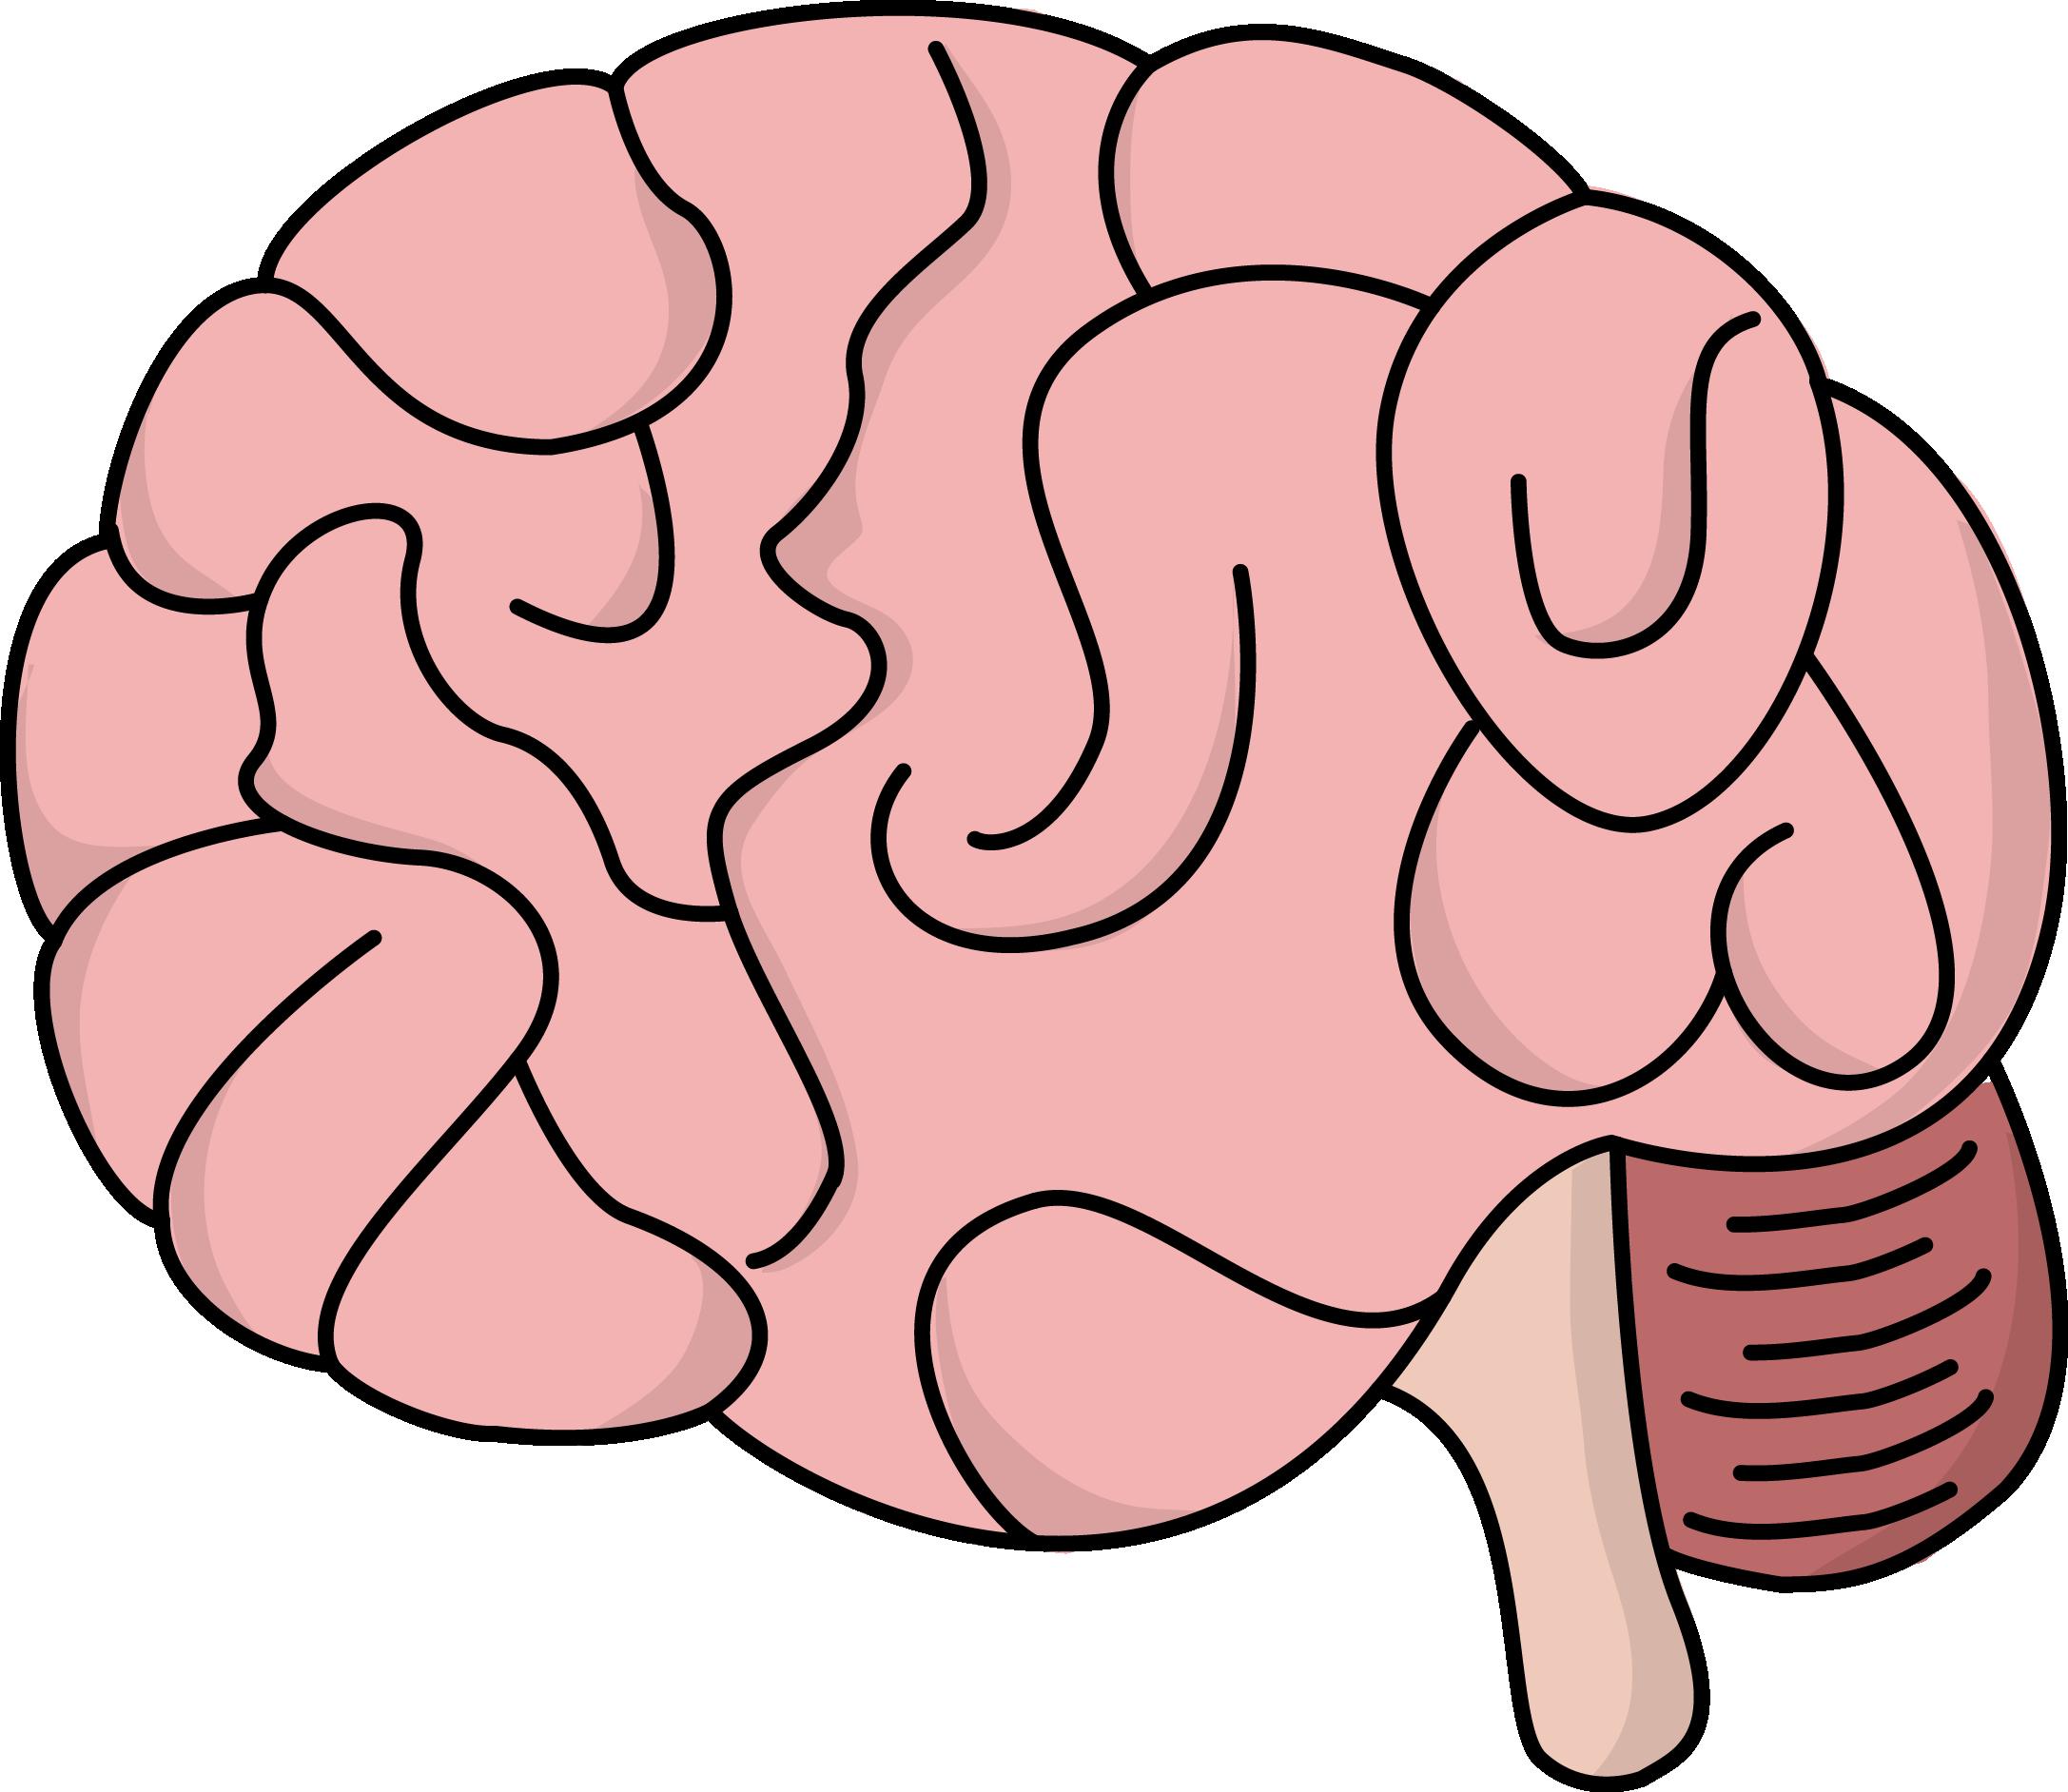 2174x1884 Hd Human Brain At Getdrawings